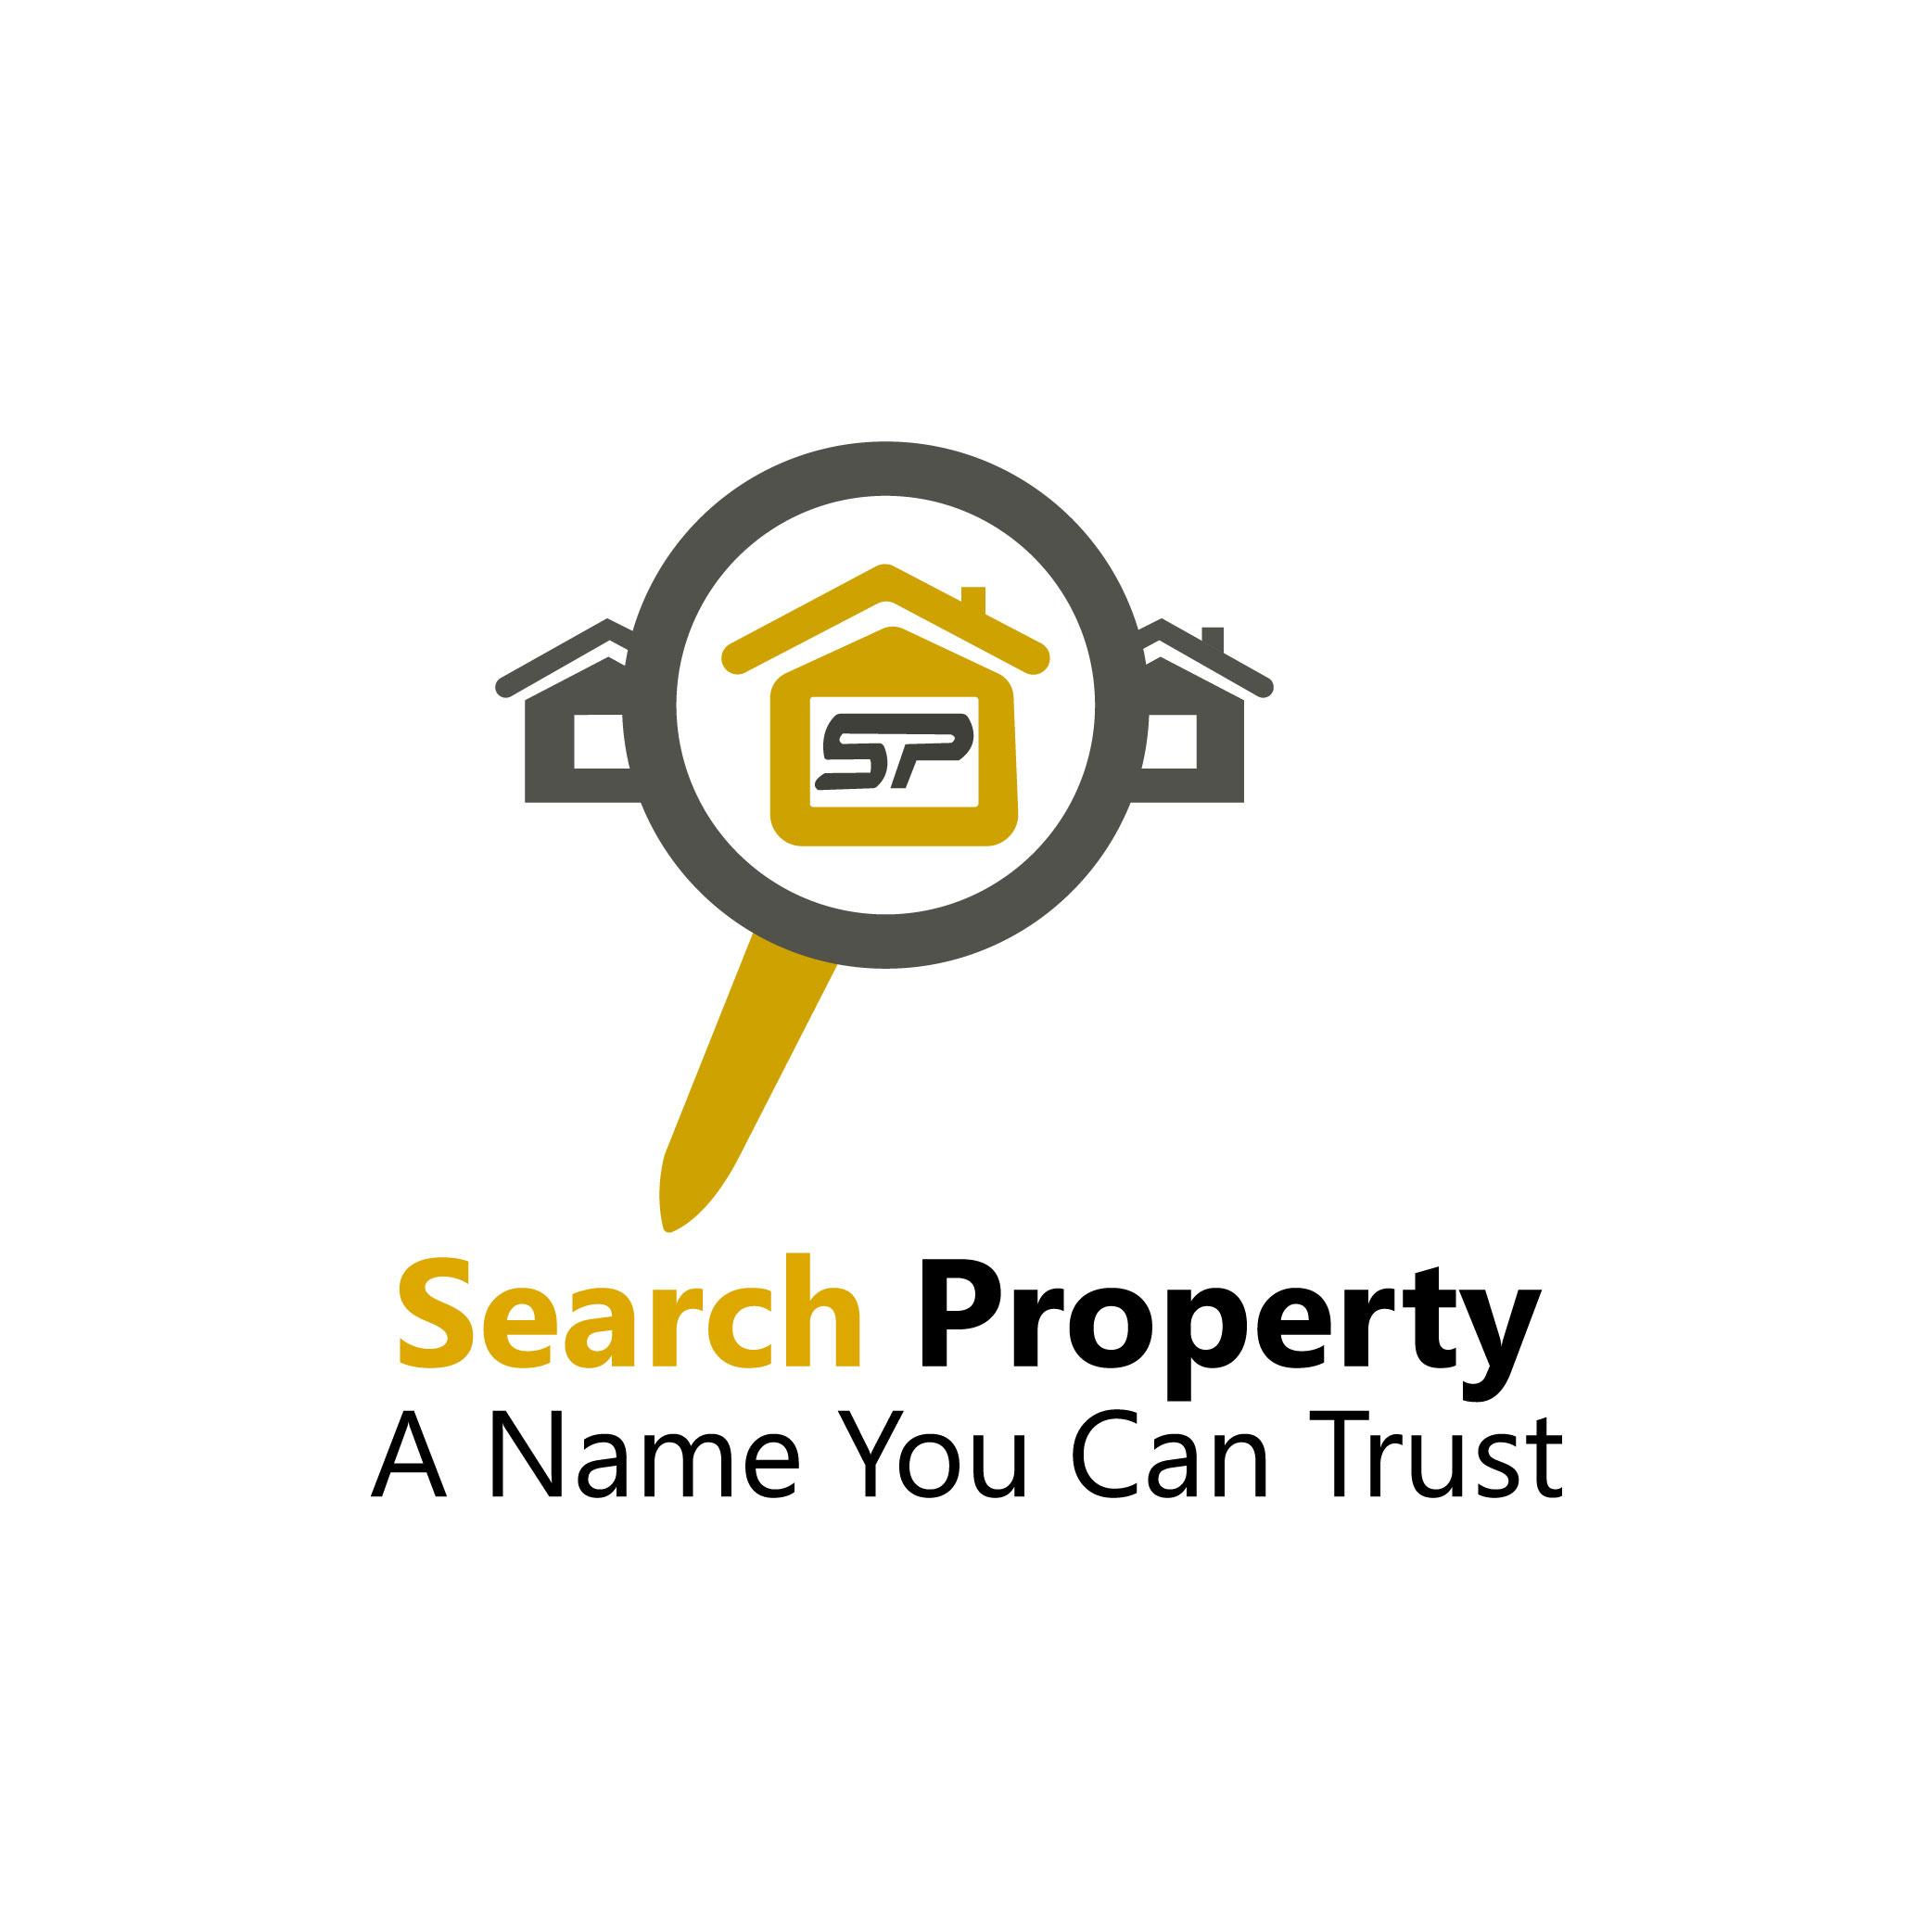 Search Property